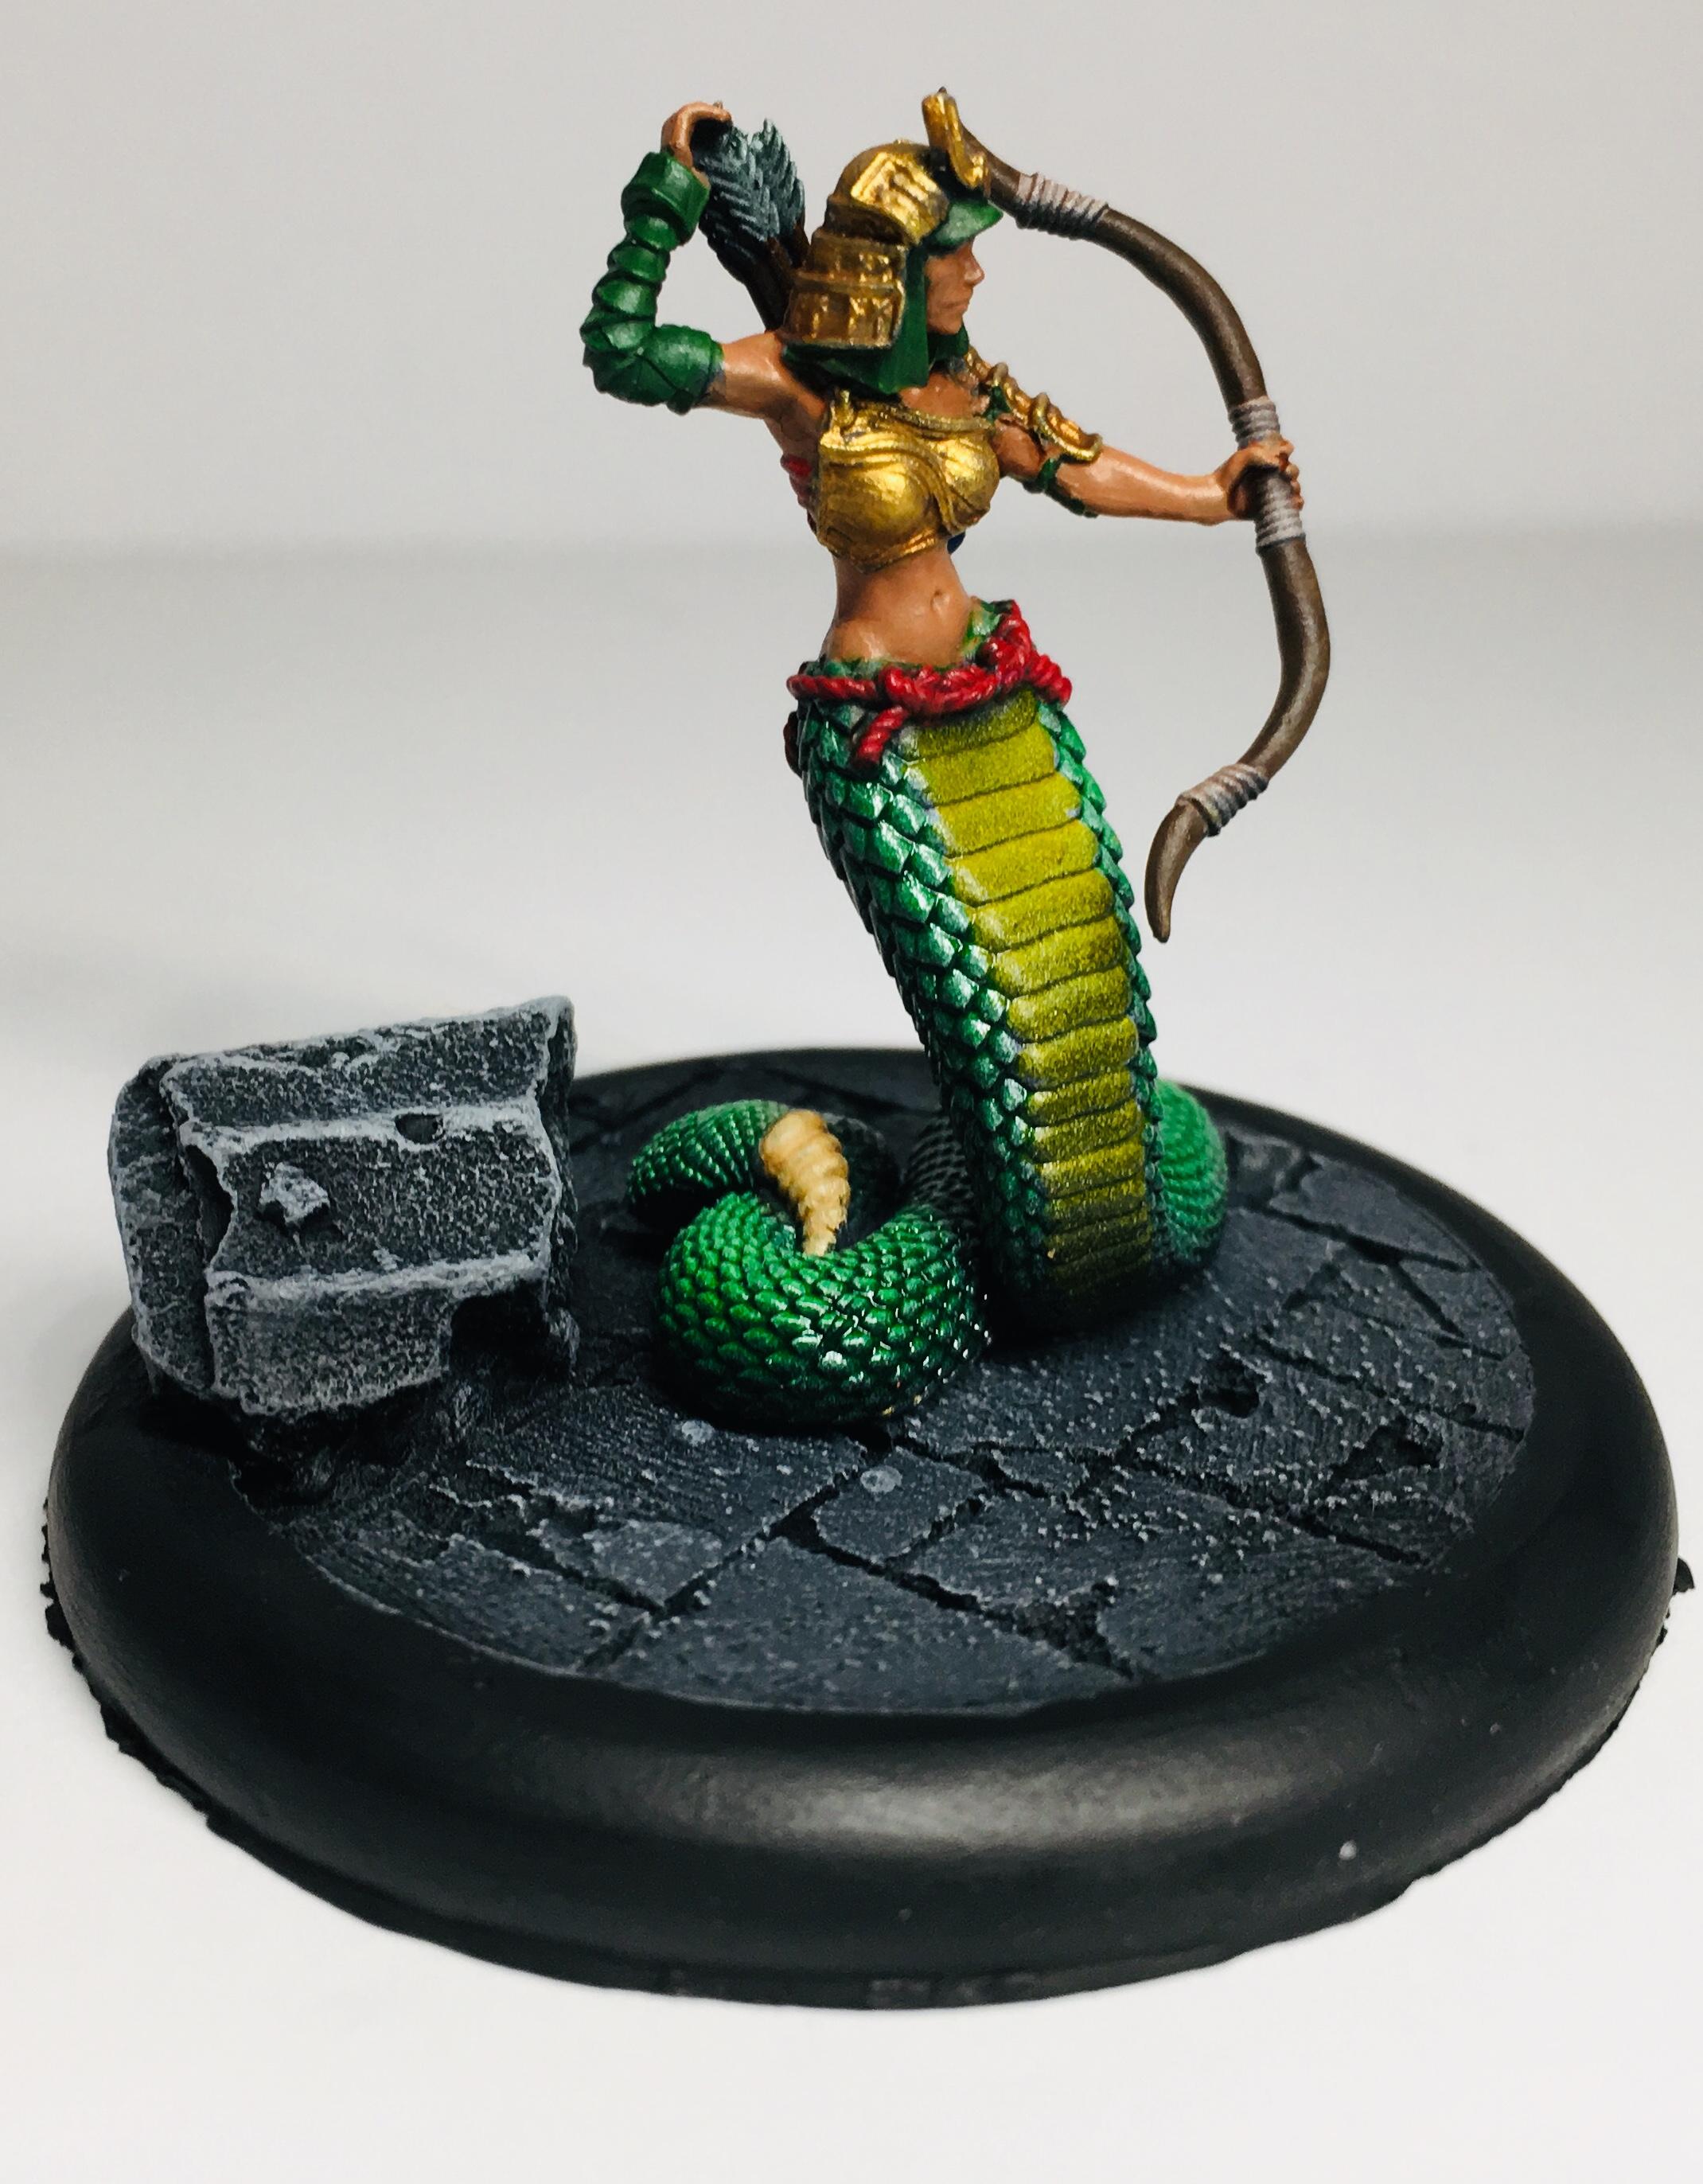 L5R Naga Huntress by Privateer Press